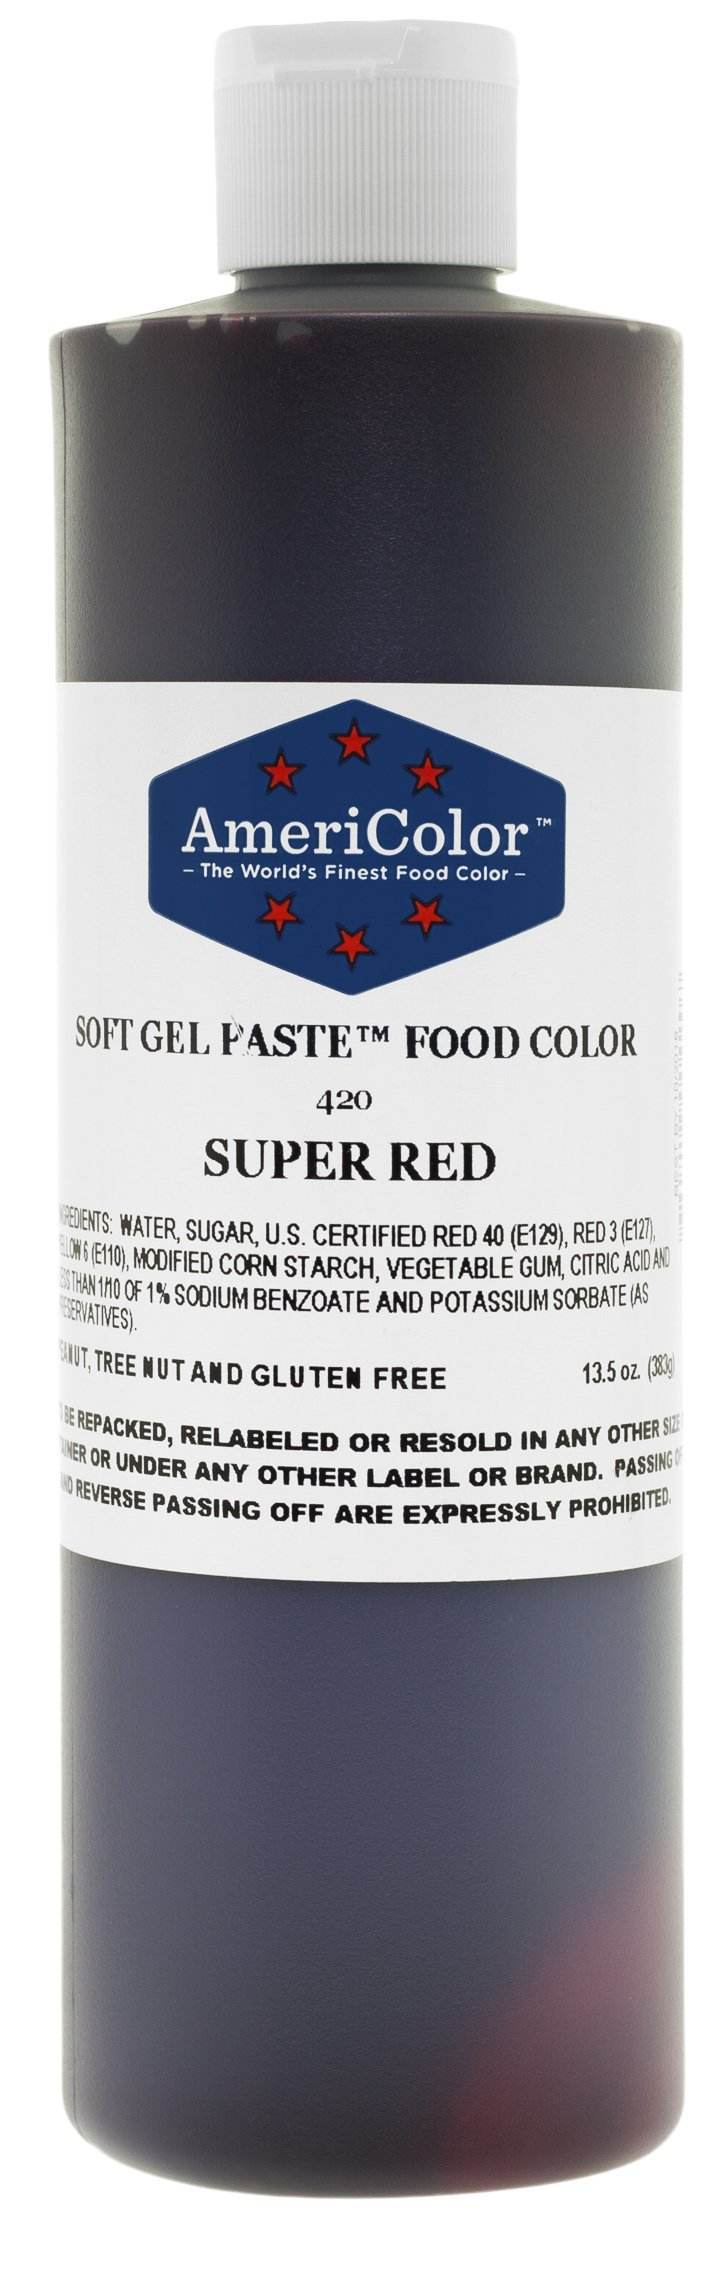 AmeriColor Food Color Super Red 13.5 Oz